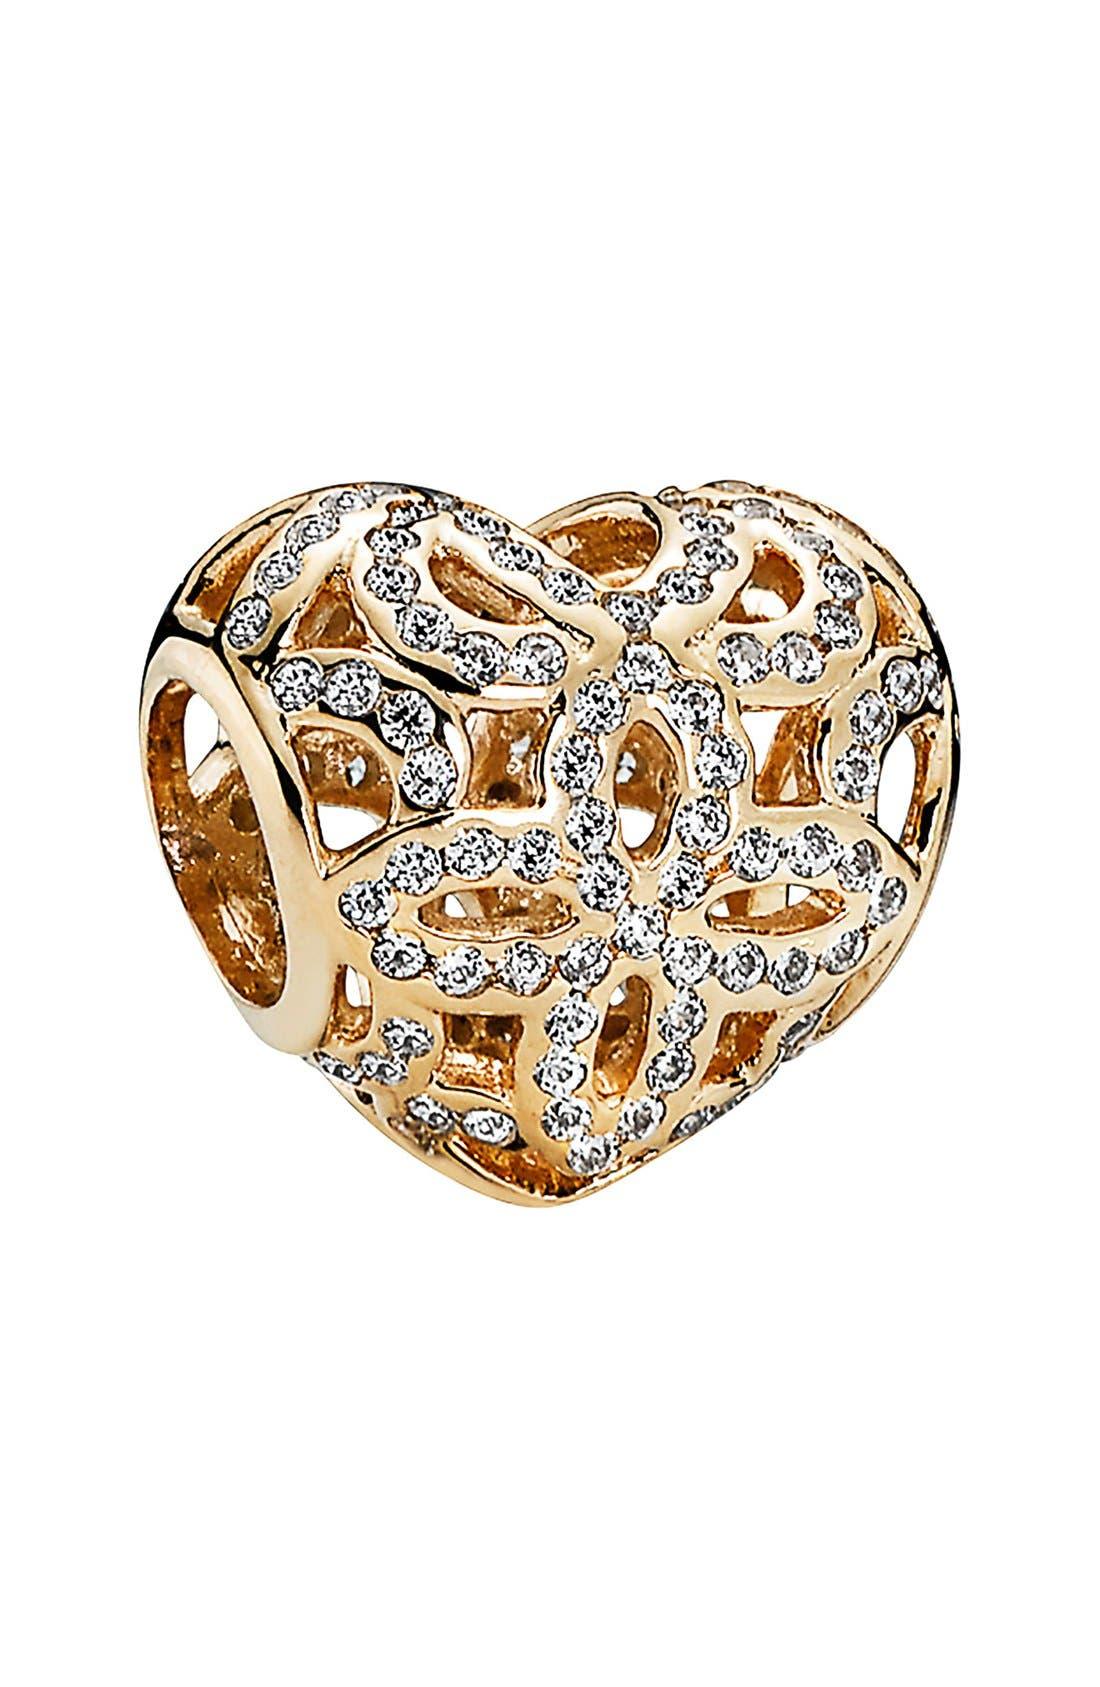 Alternate Image 1 Selected - PANDORA 'Love Appreciation' Charm